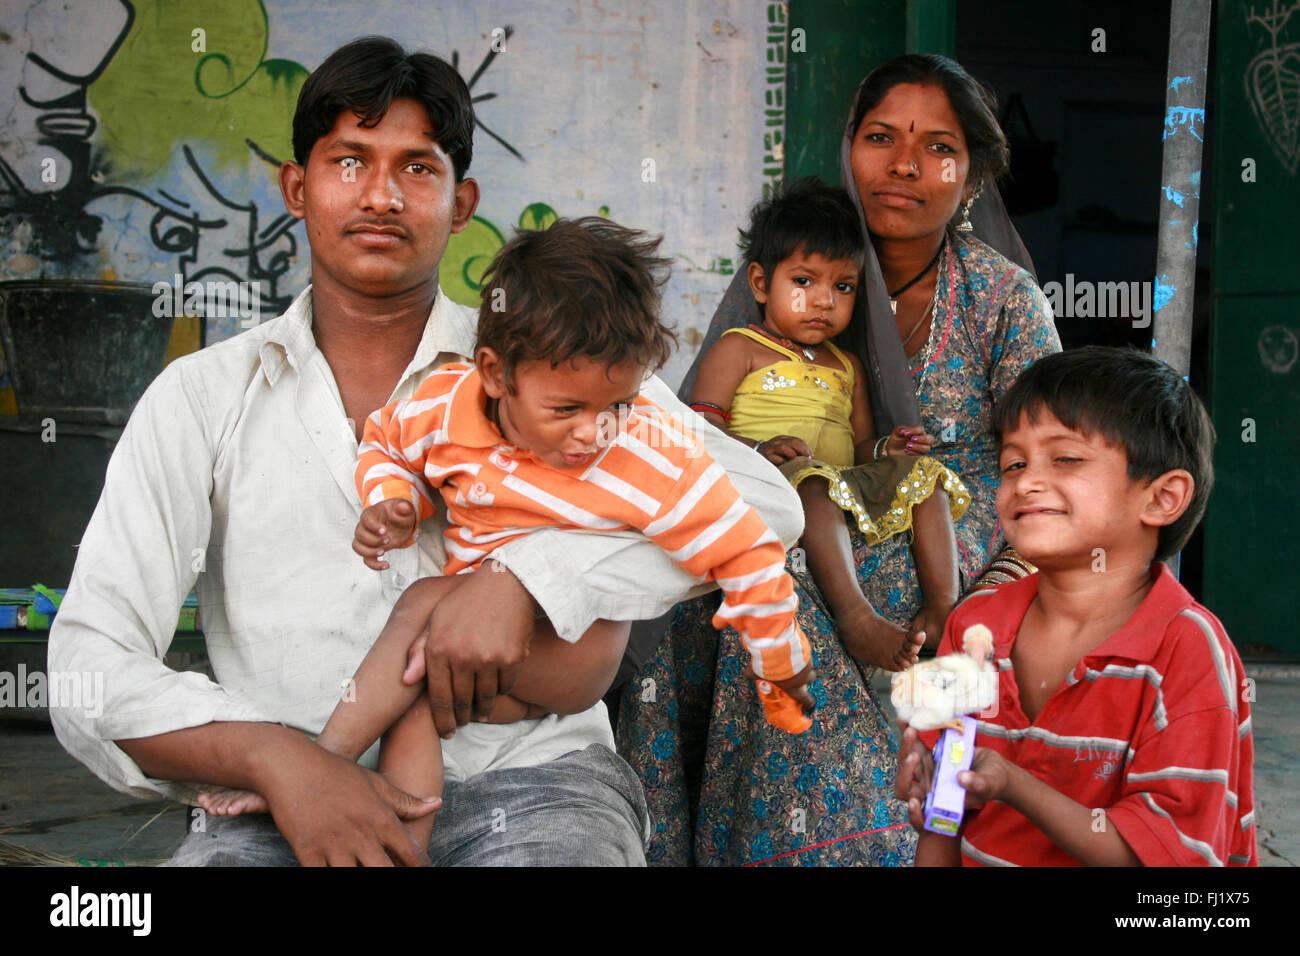 Famiglia di Rajasthani in Pushkar, India Immagini Stock